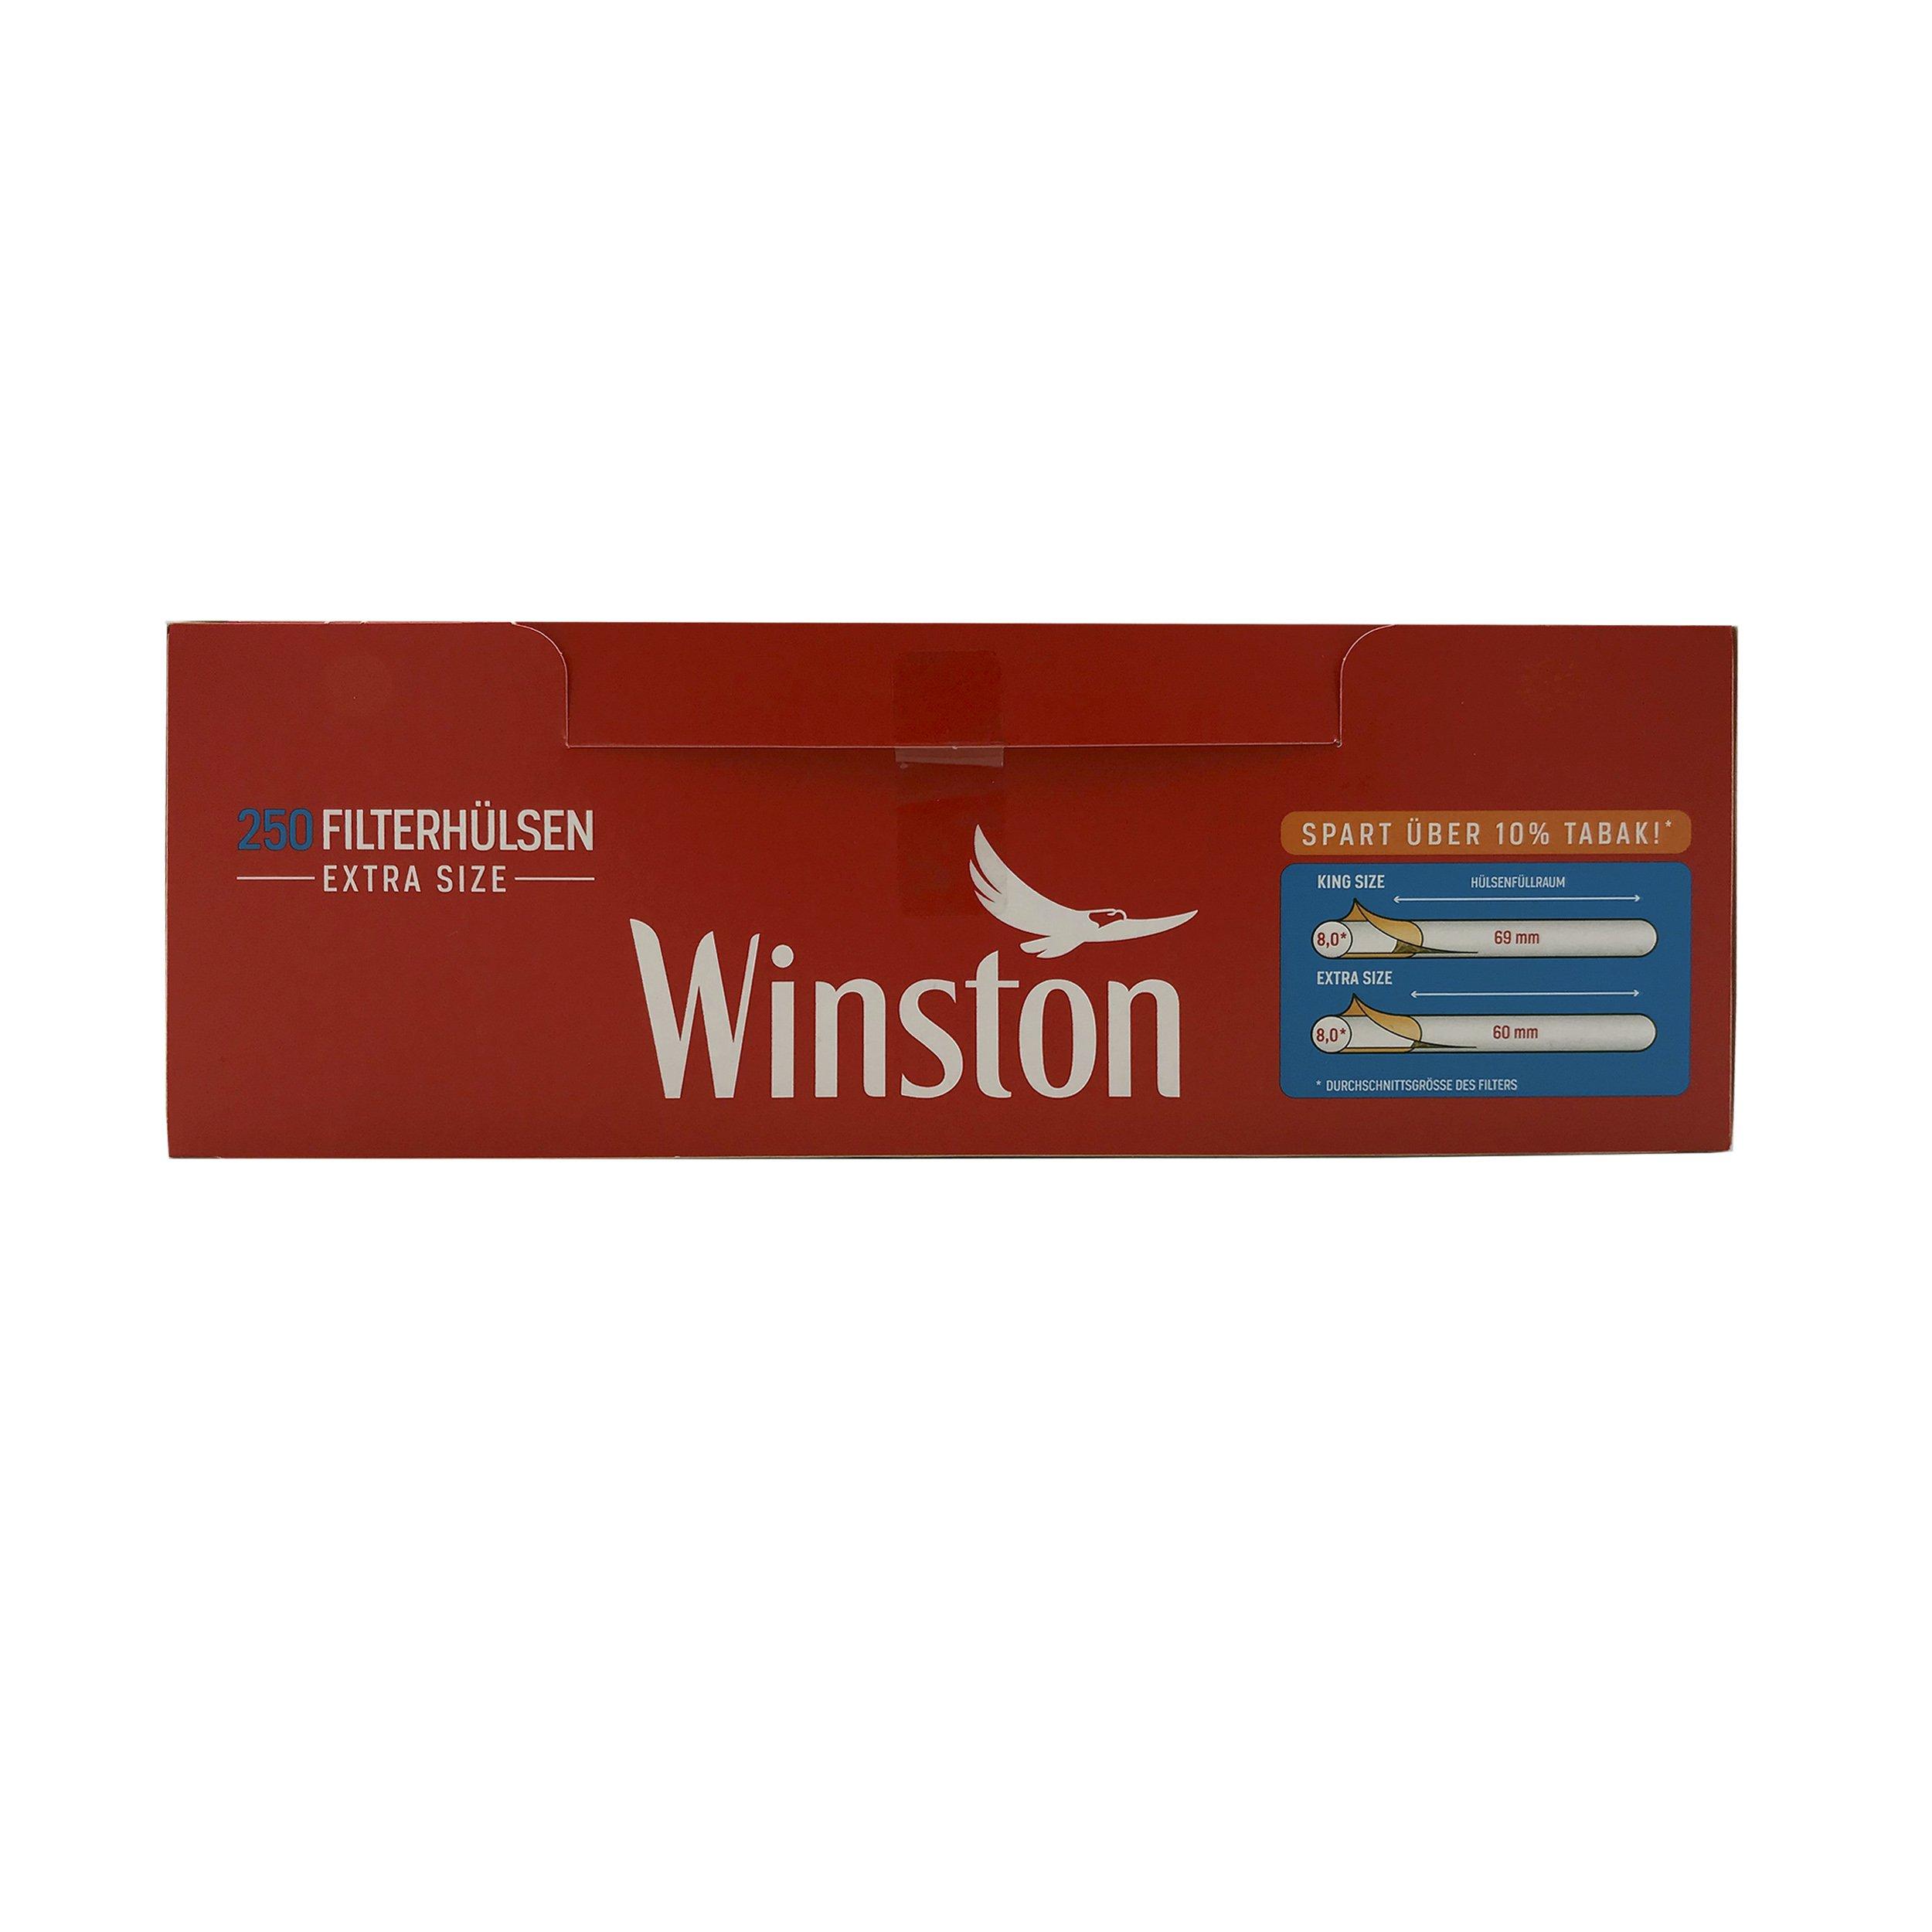 250 Winston Extra Filterhülsen